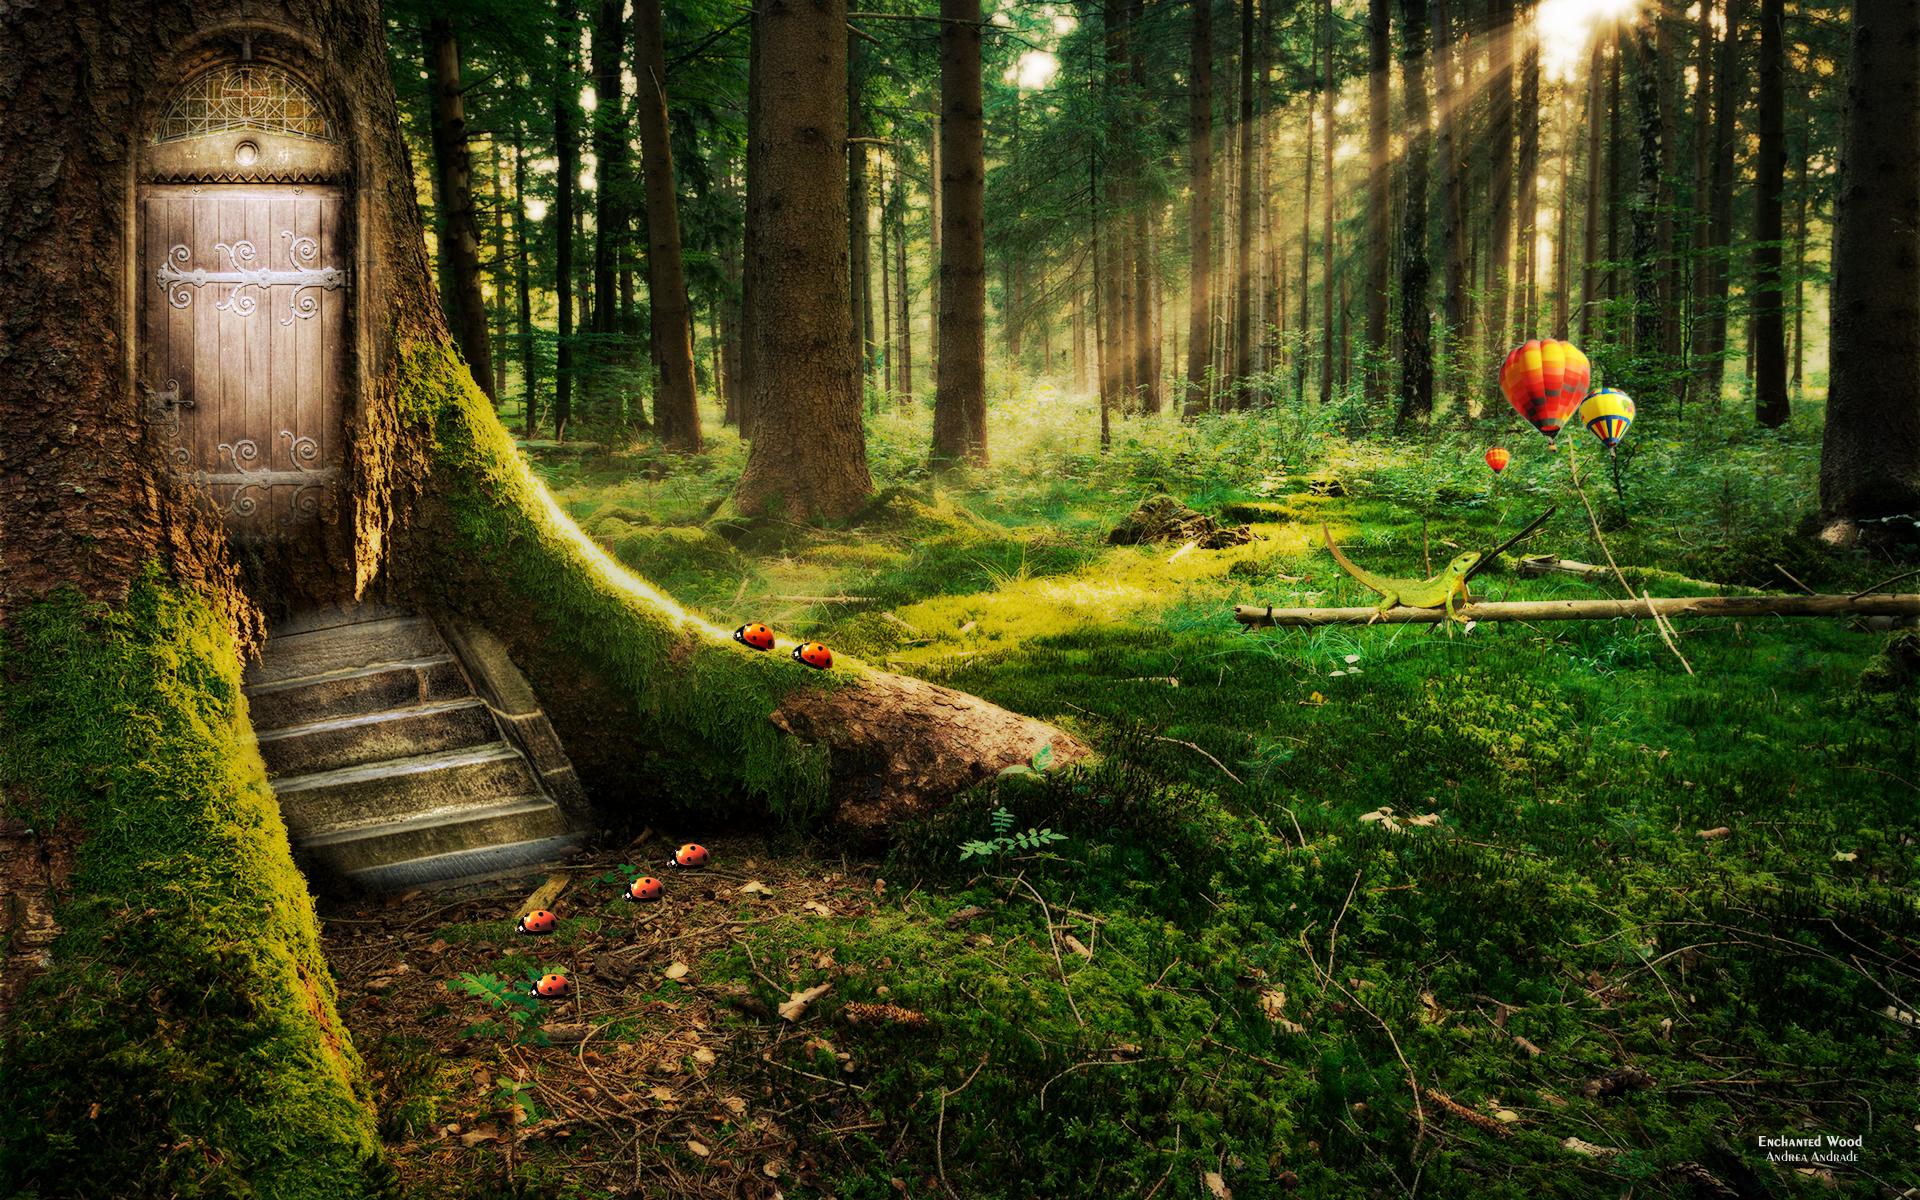 Forest Wallpapers for Desktop - WallpaperSafari